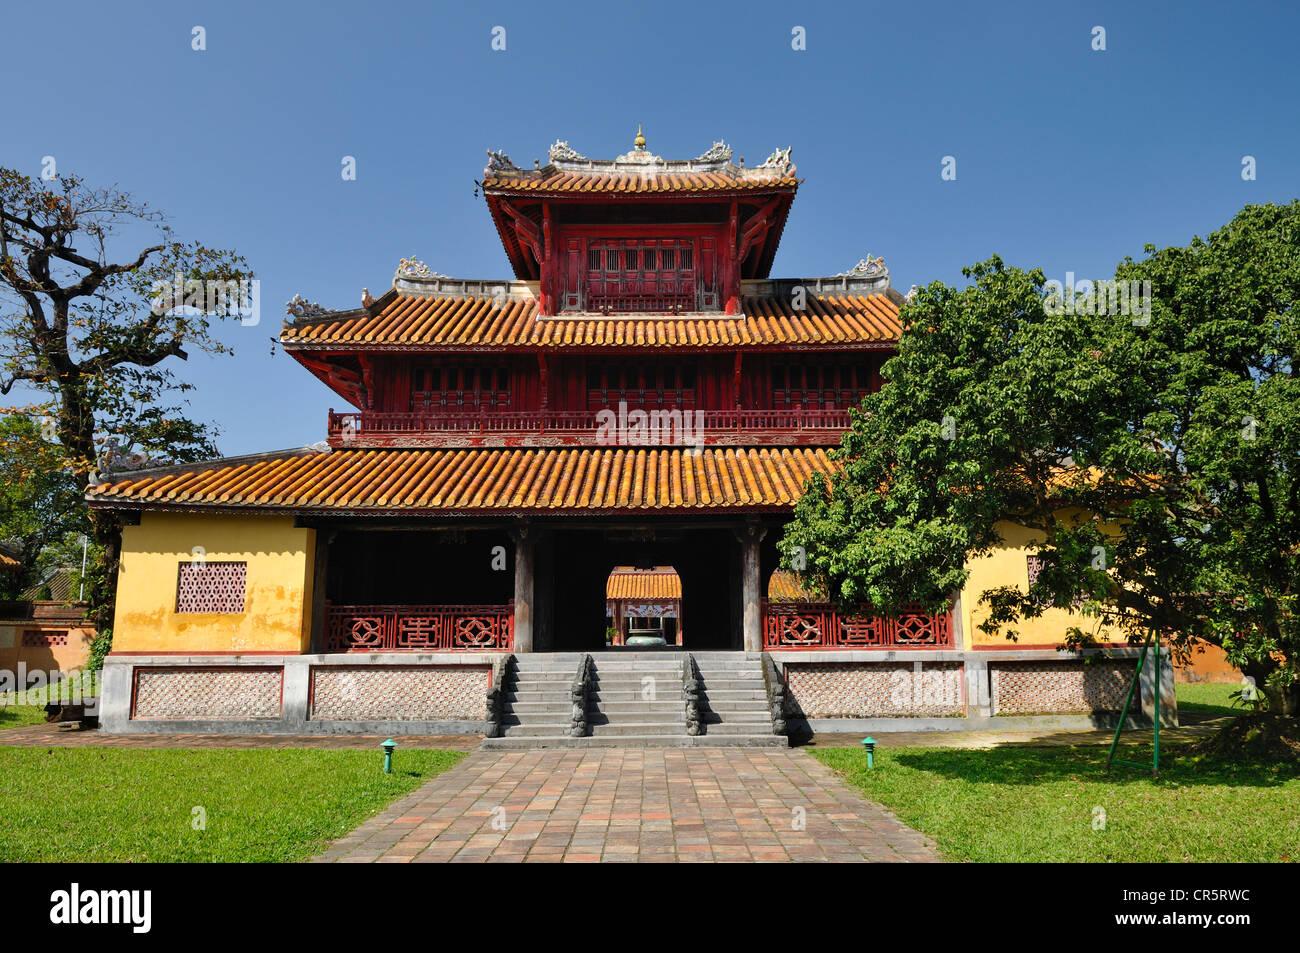 Hien Lam pavilion in the citadel, Mandarin halls, Hoang Thanh Imperial Palace, Forbidden City, Hue, UNESCO World - Stock Image